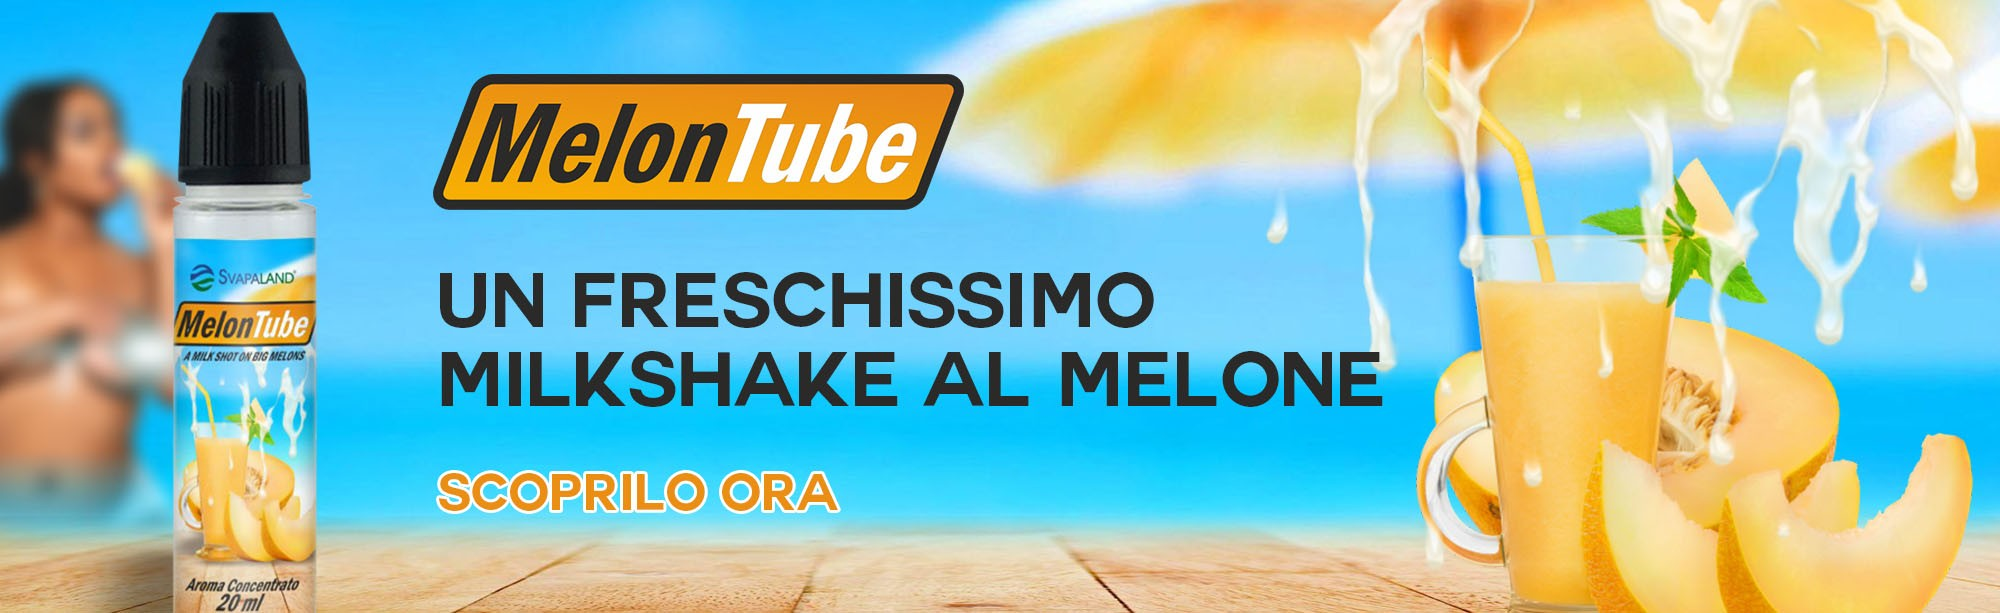 MelonTube